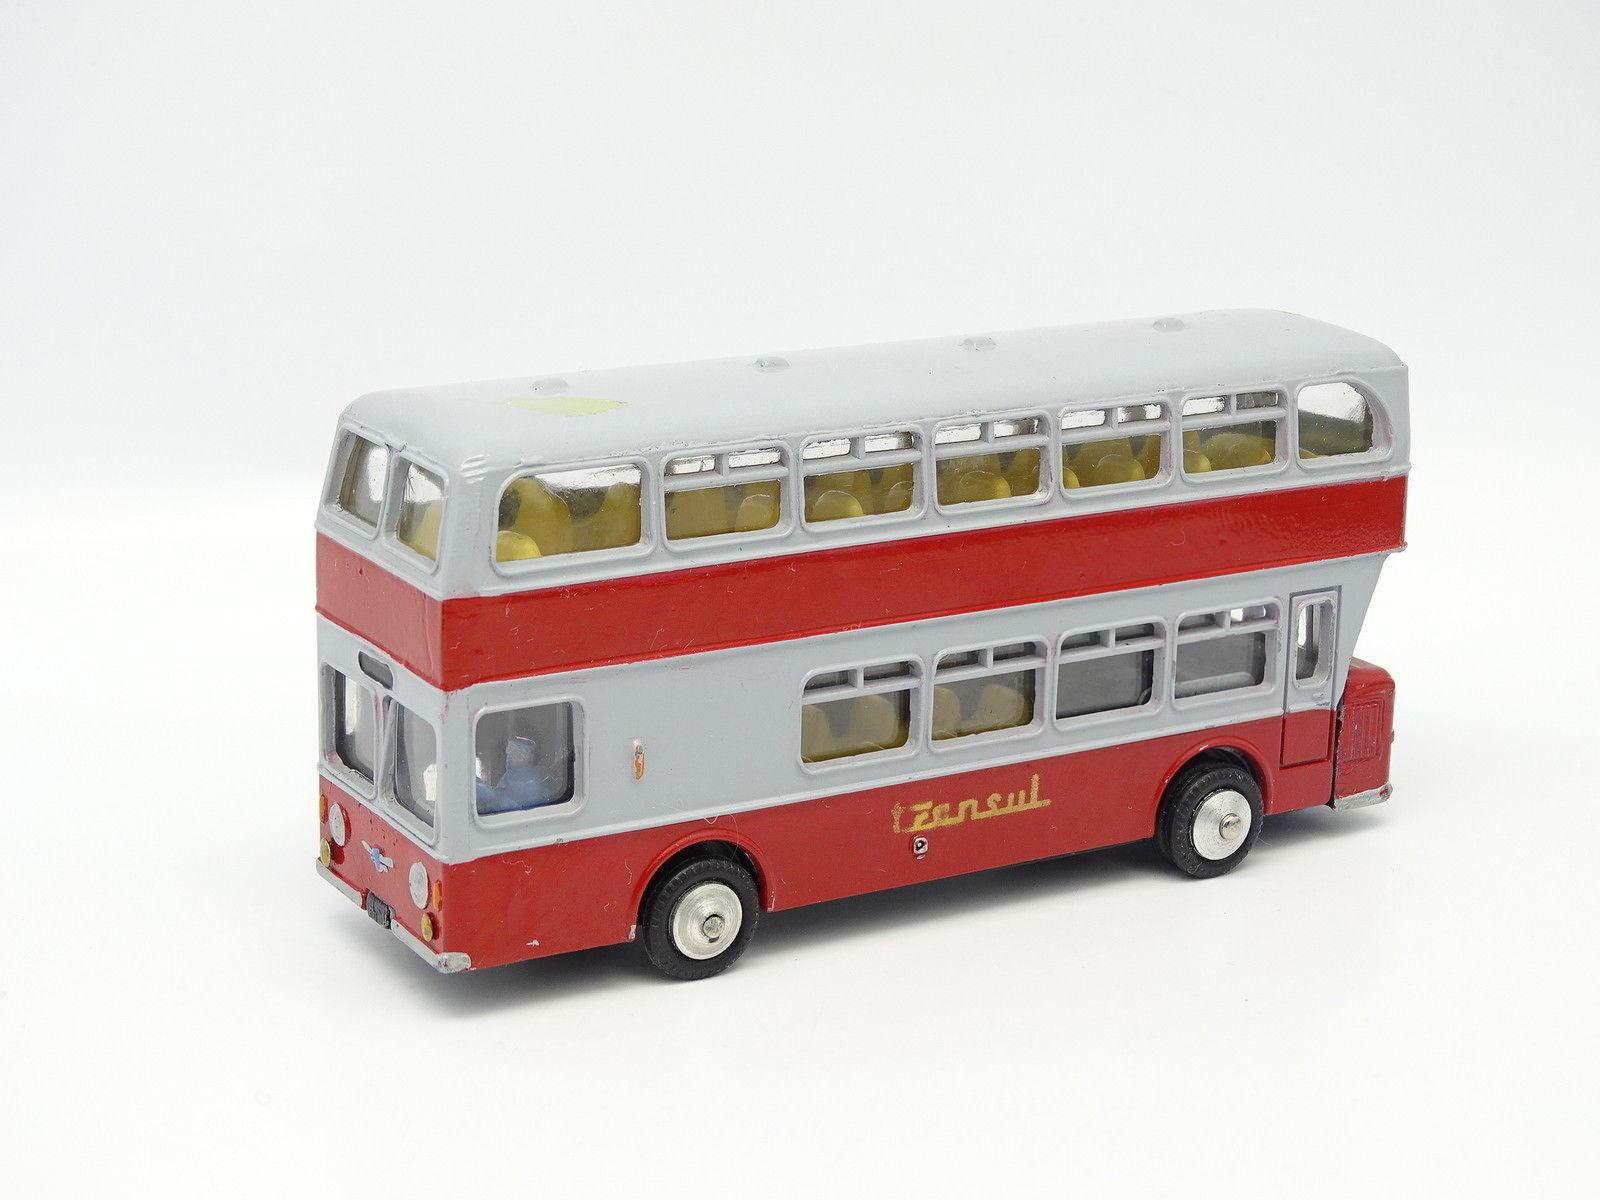 Metosul 1 66 - Bus Car autocarro pisos seibu